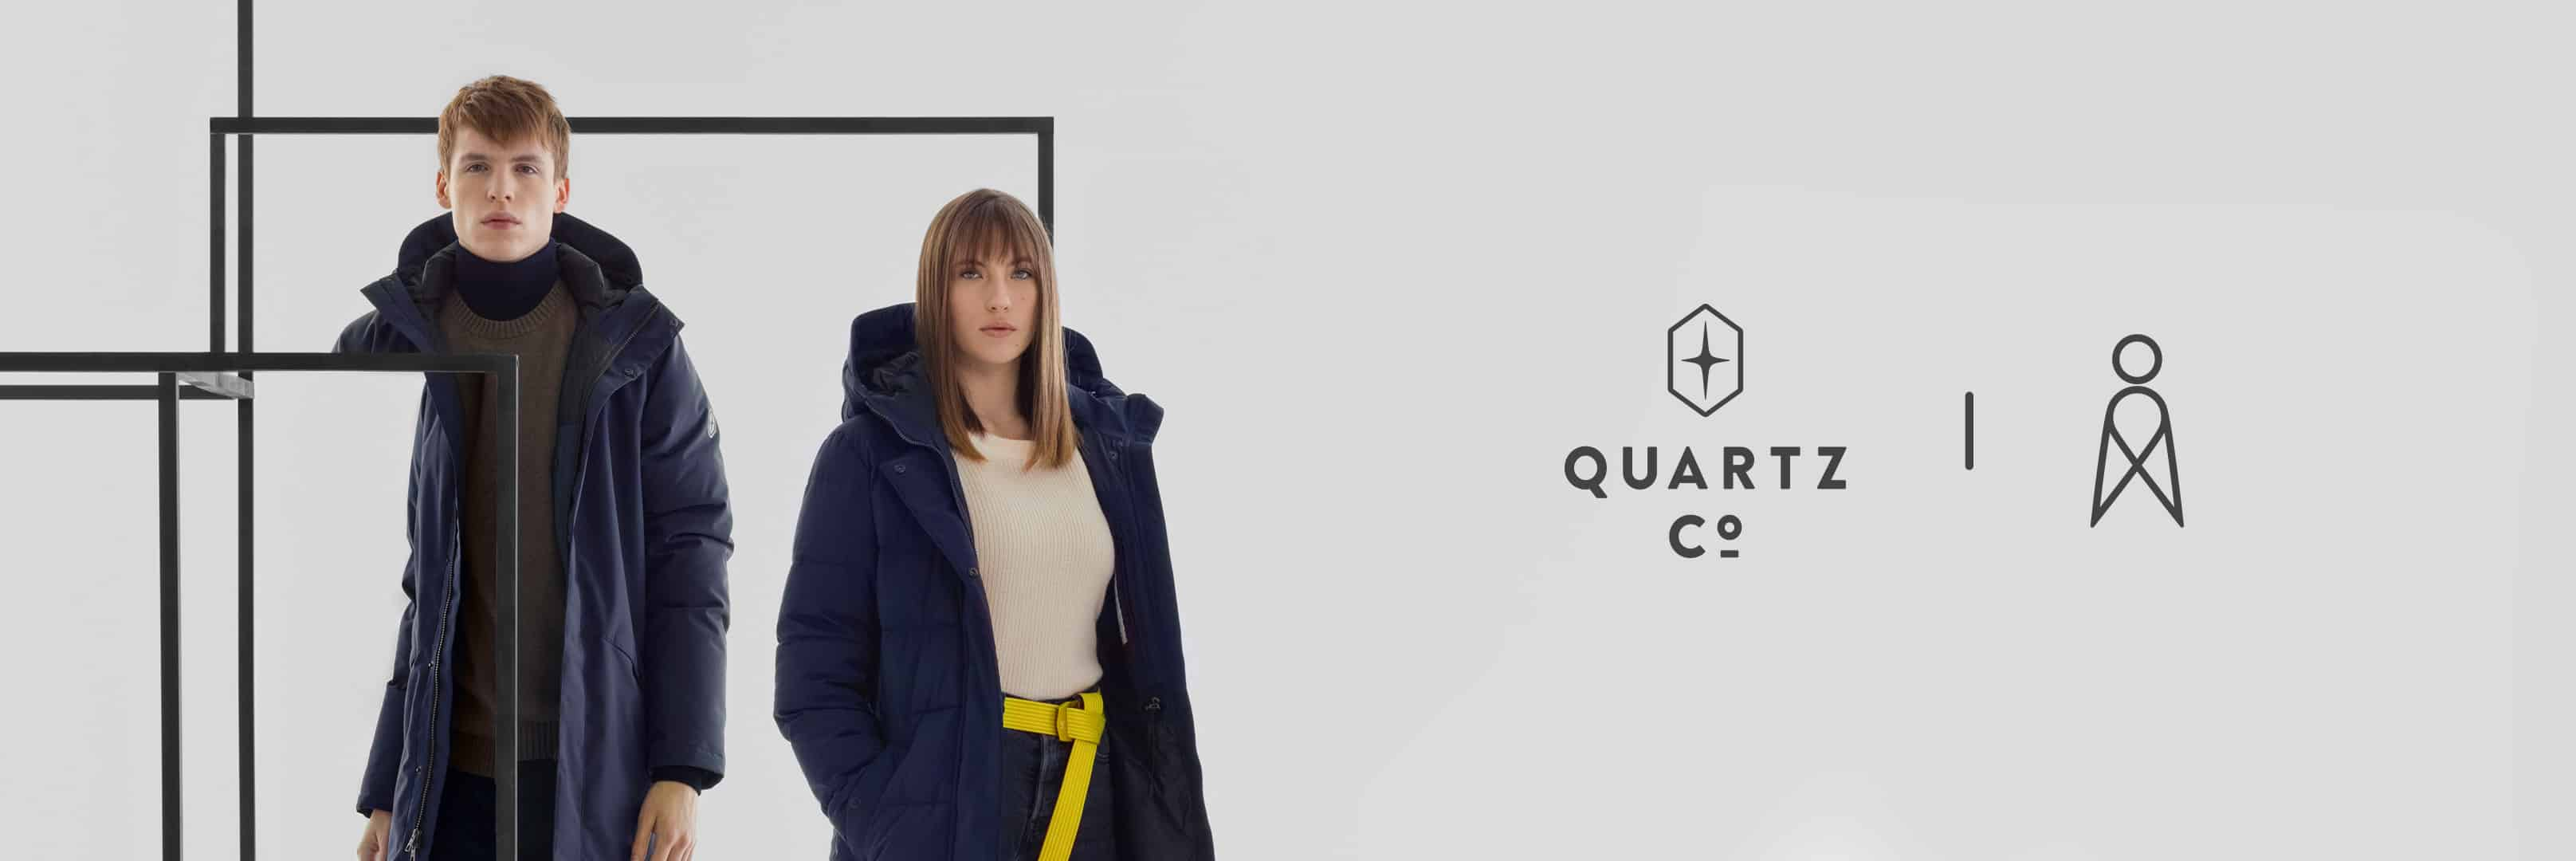 Quartz Co.. Altitude Sports x Quartz Co. | Meet Jane & Clark